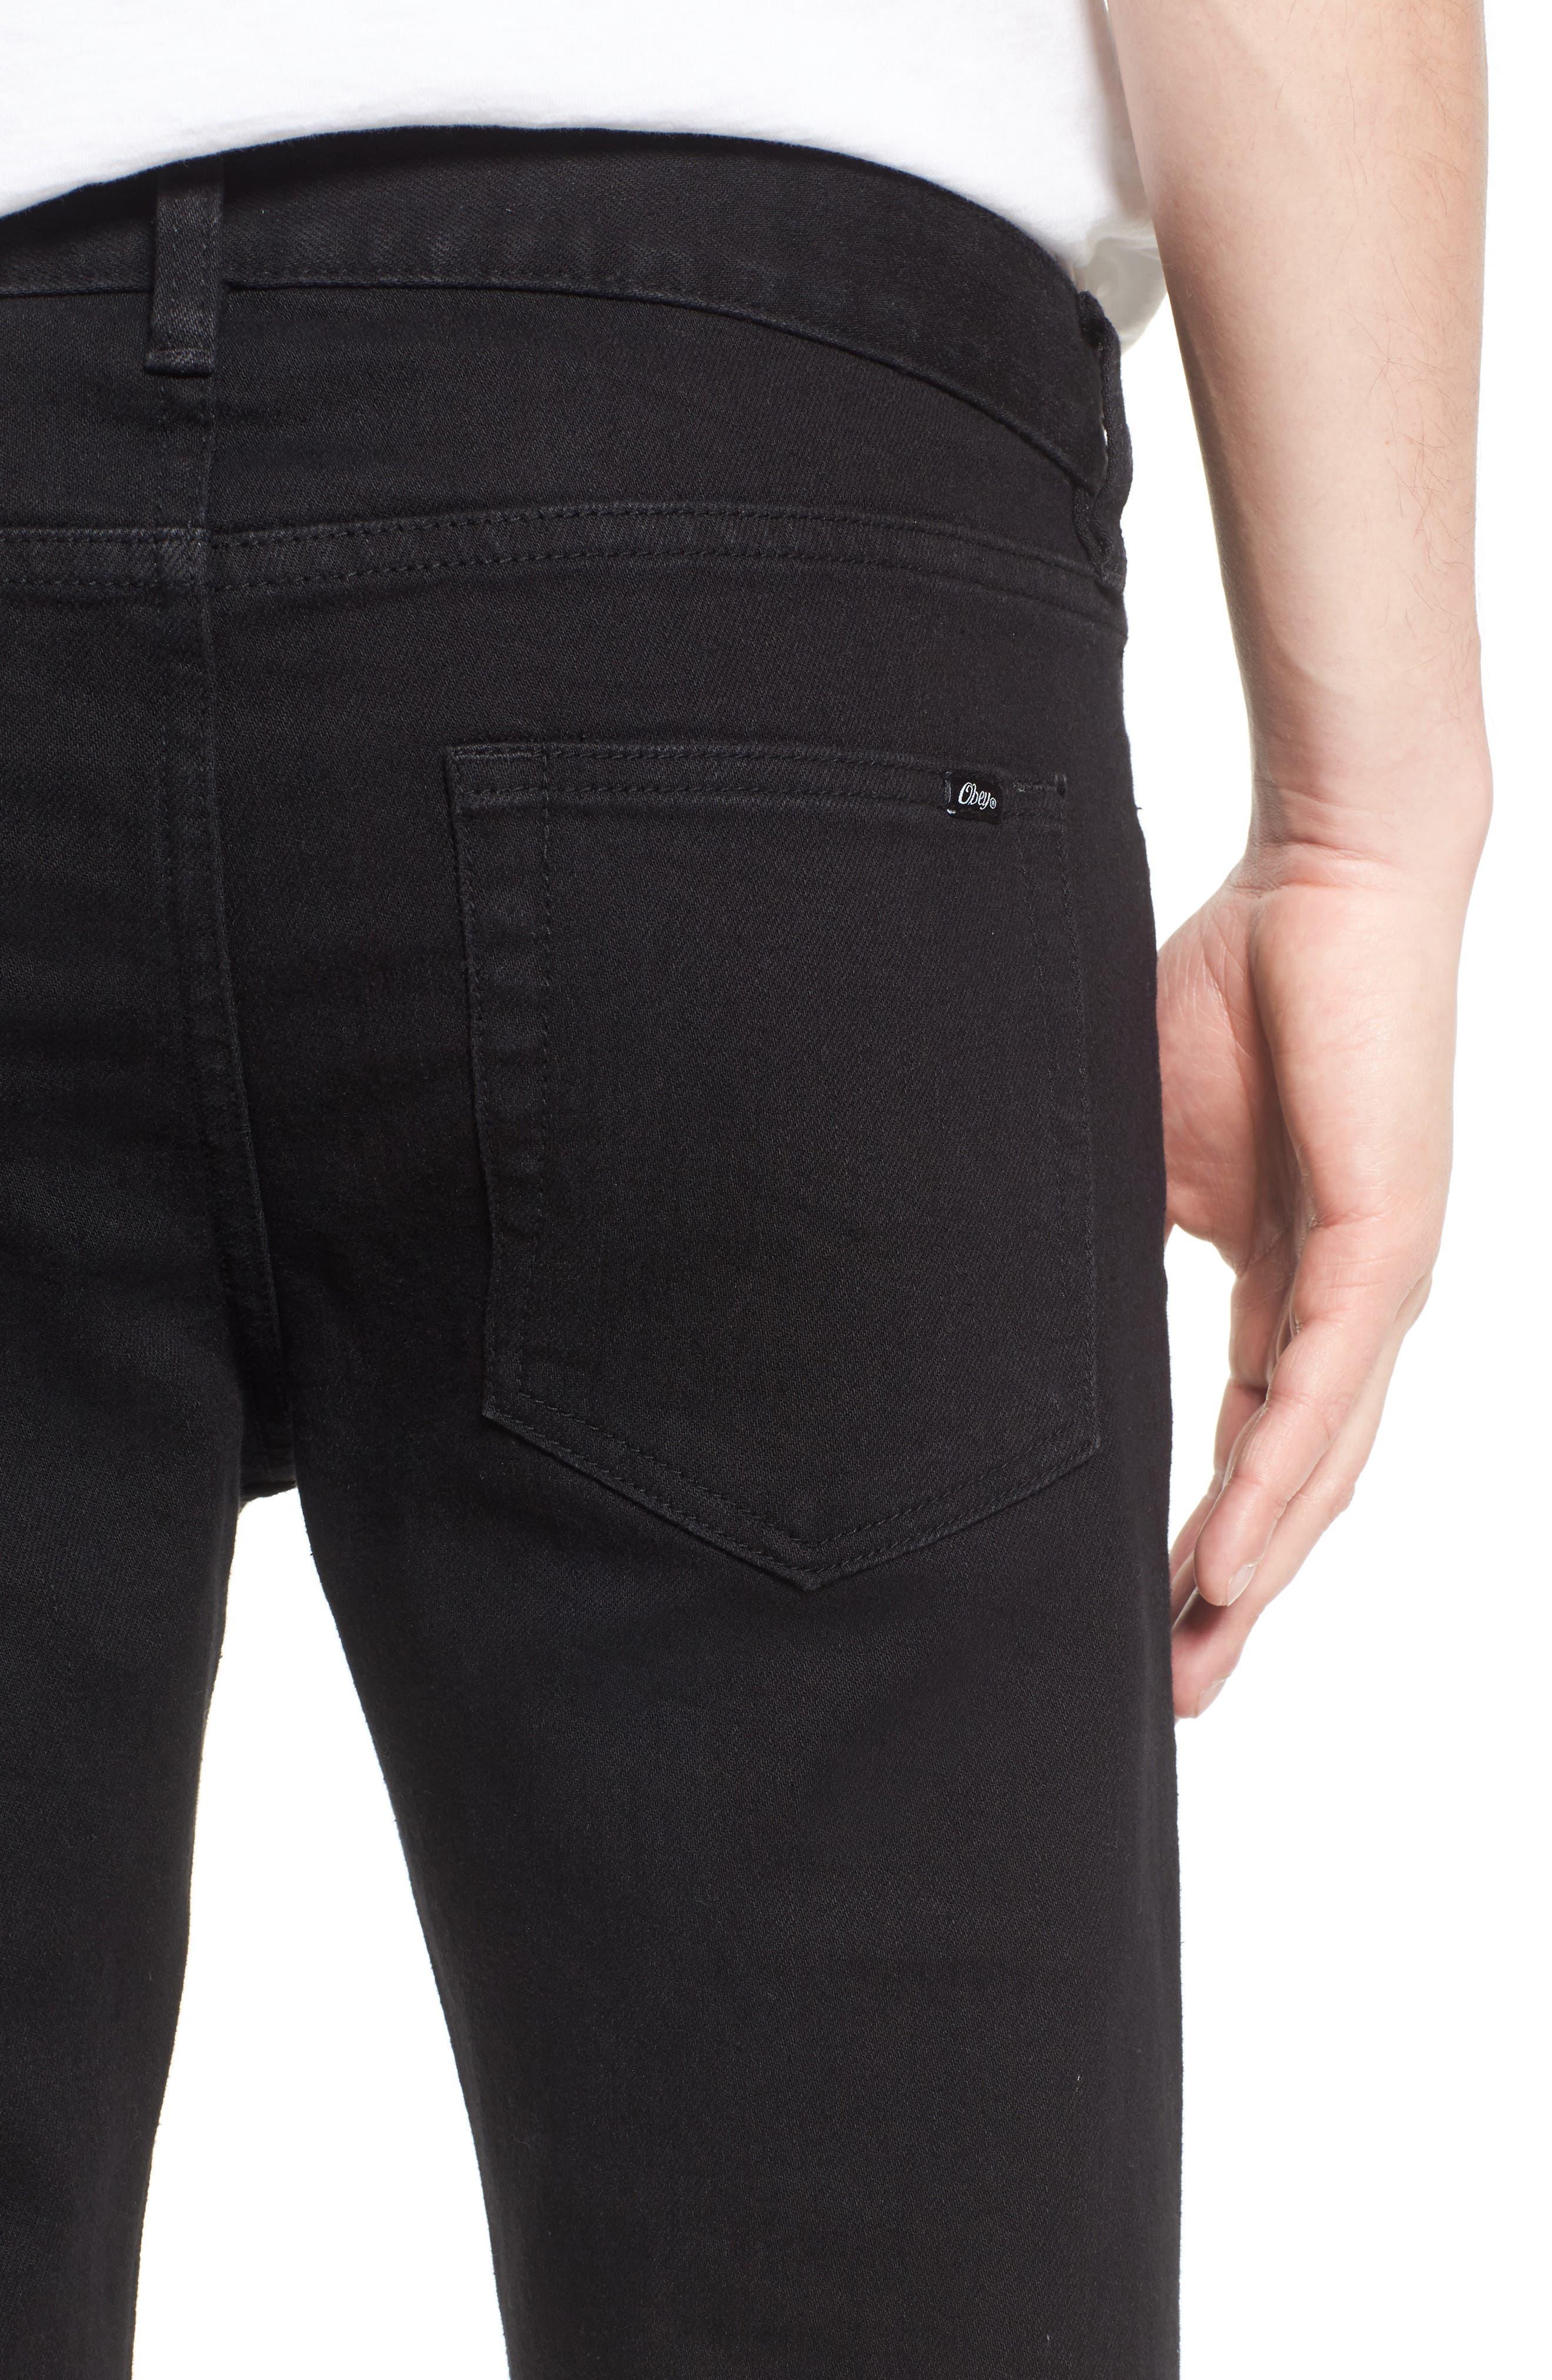 Juvee II Skinny Fit Jeans,                             Alternate thumbnail 4, color,                             Black